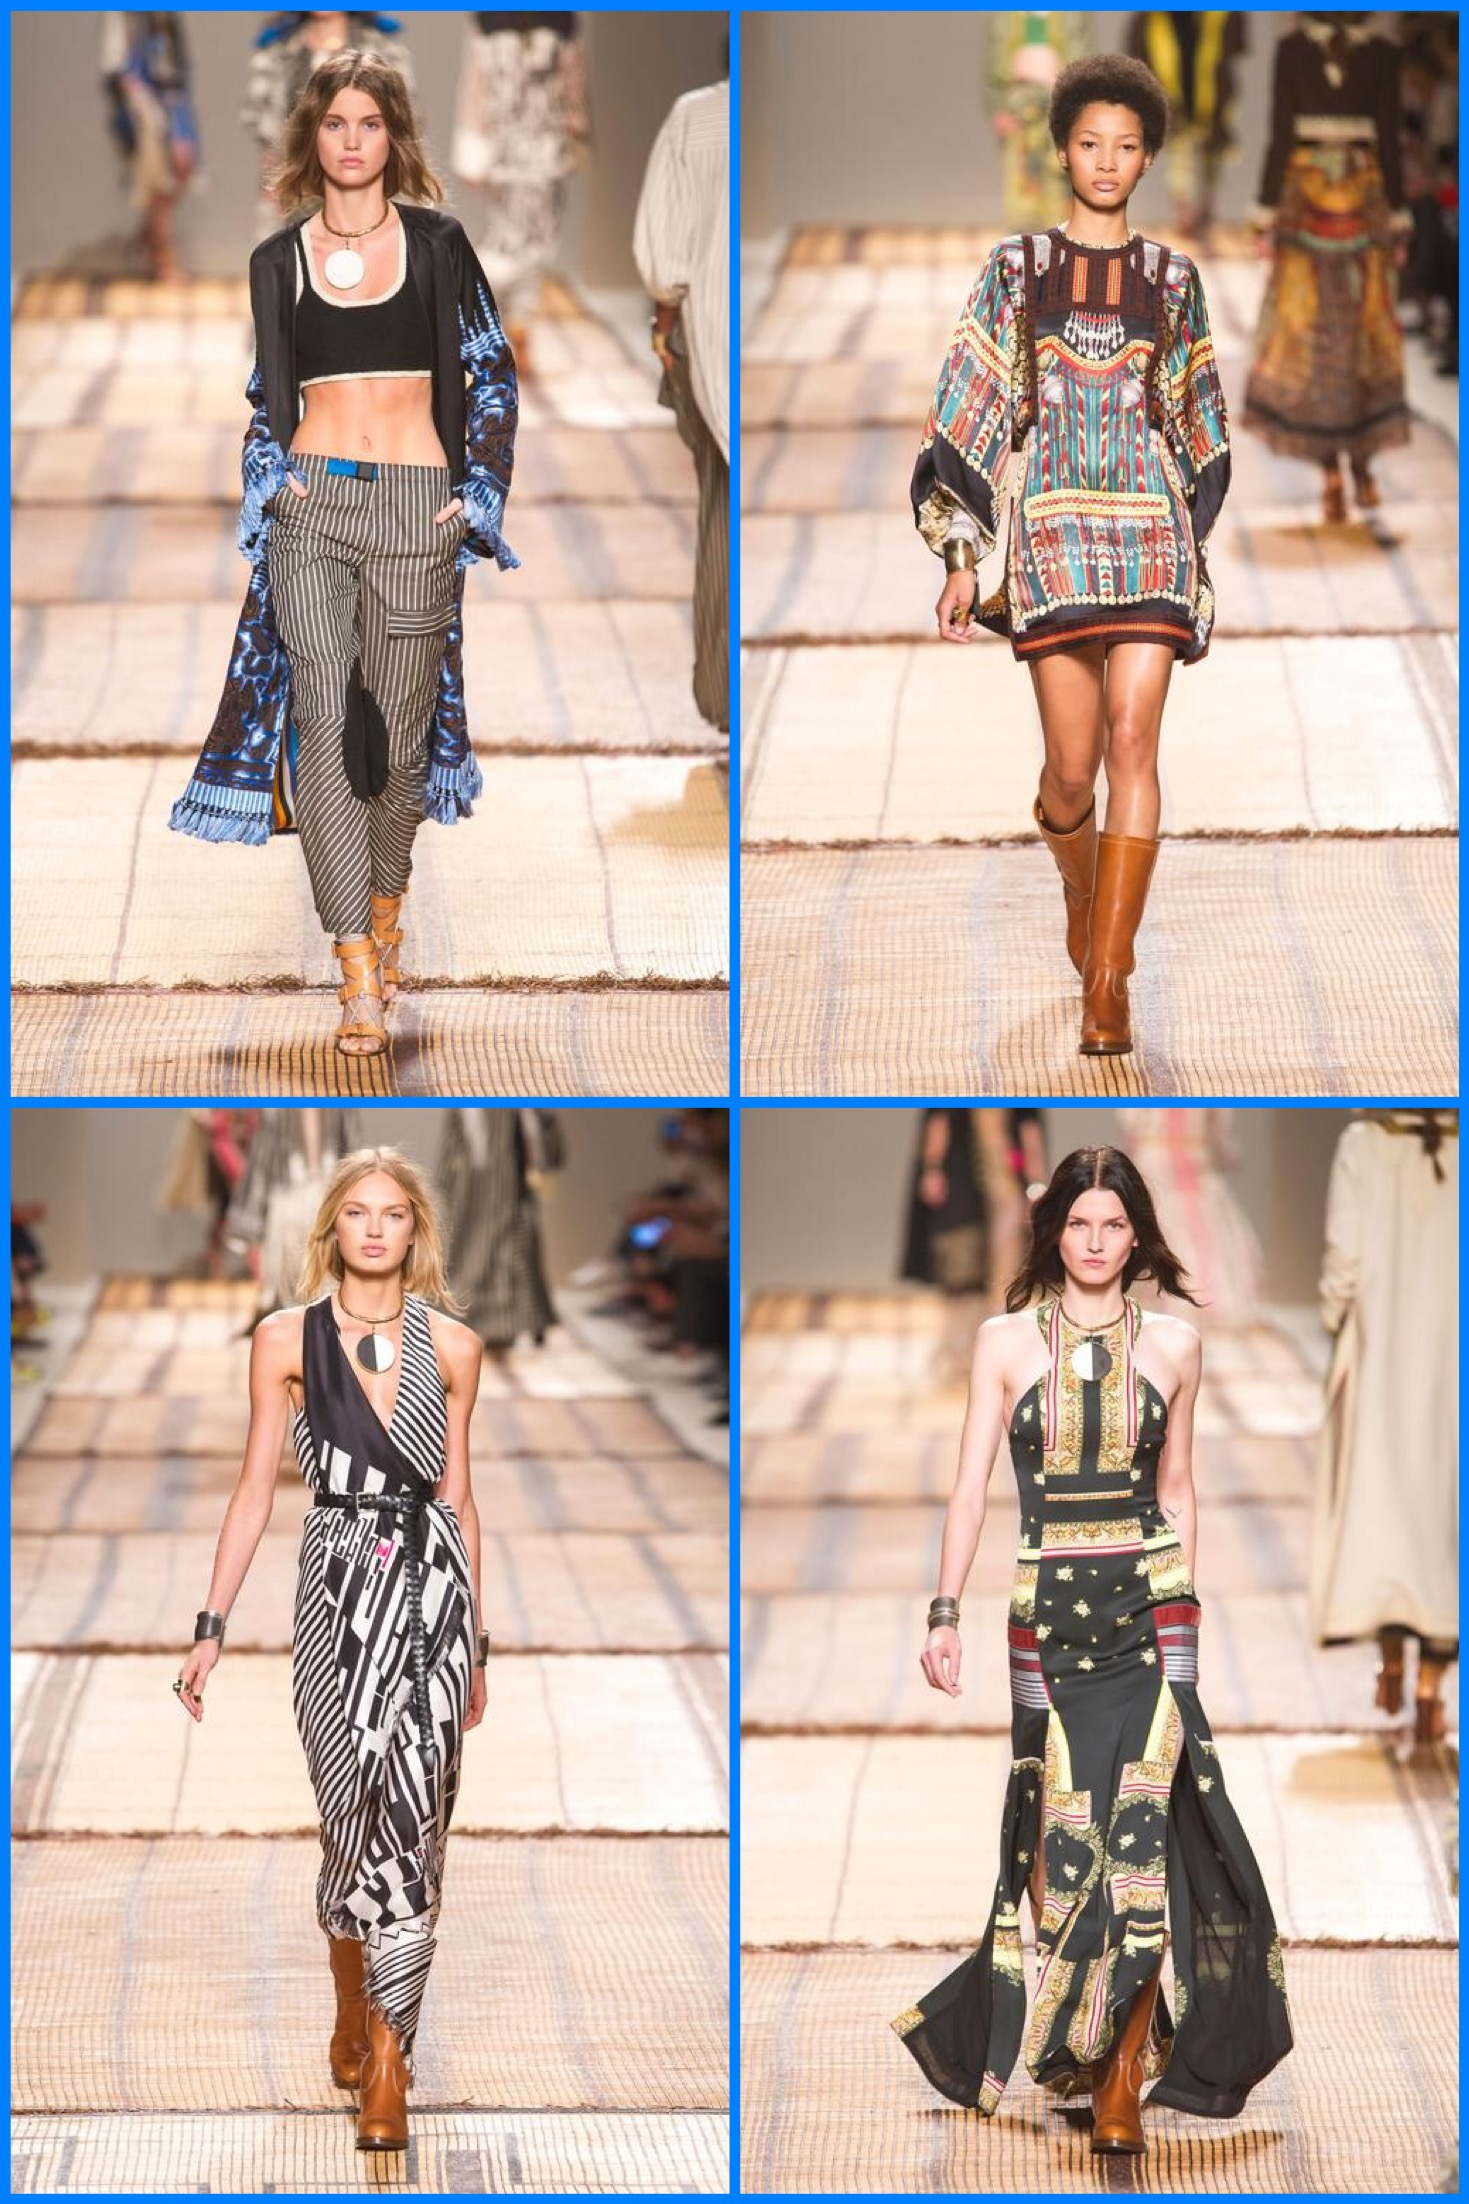 milano-fashion-week-pret-a-porter-spring-summer-2017-style-etro